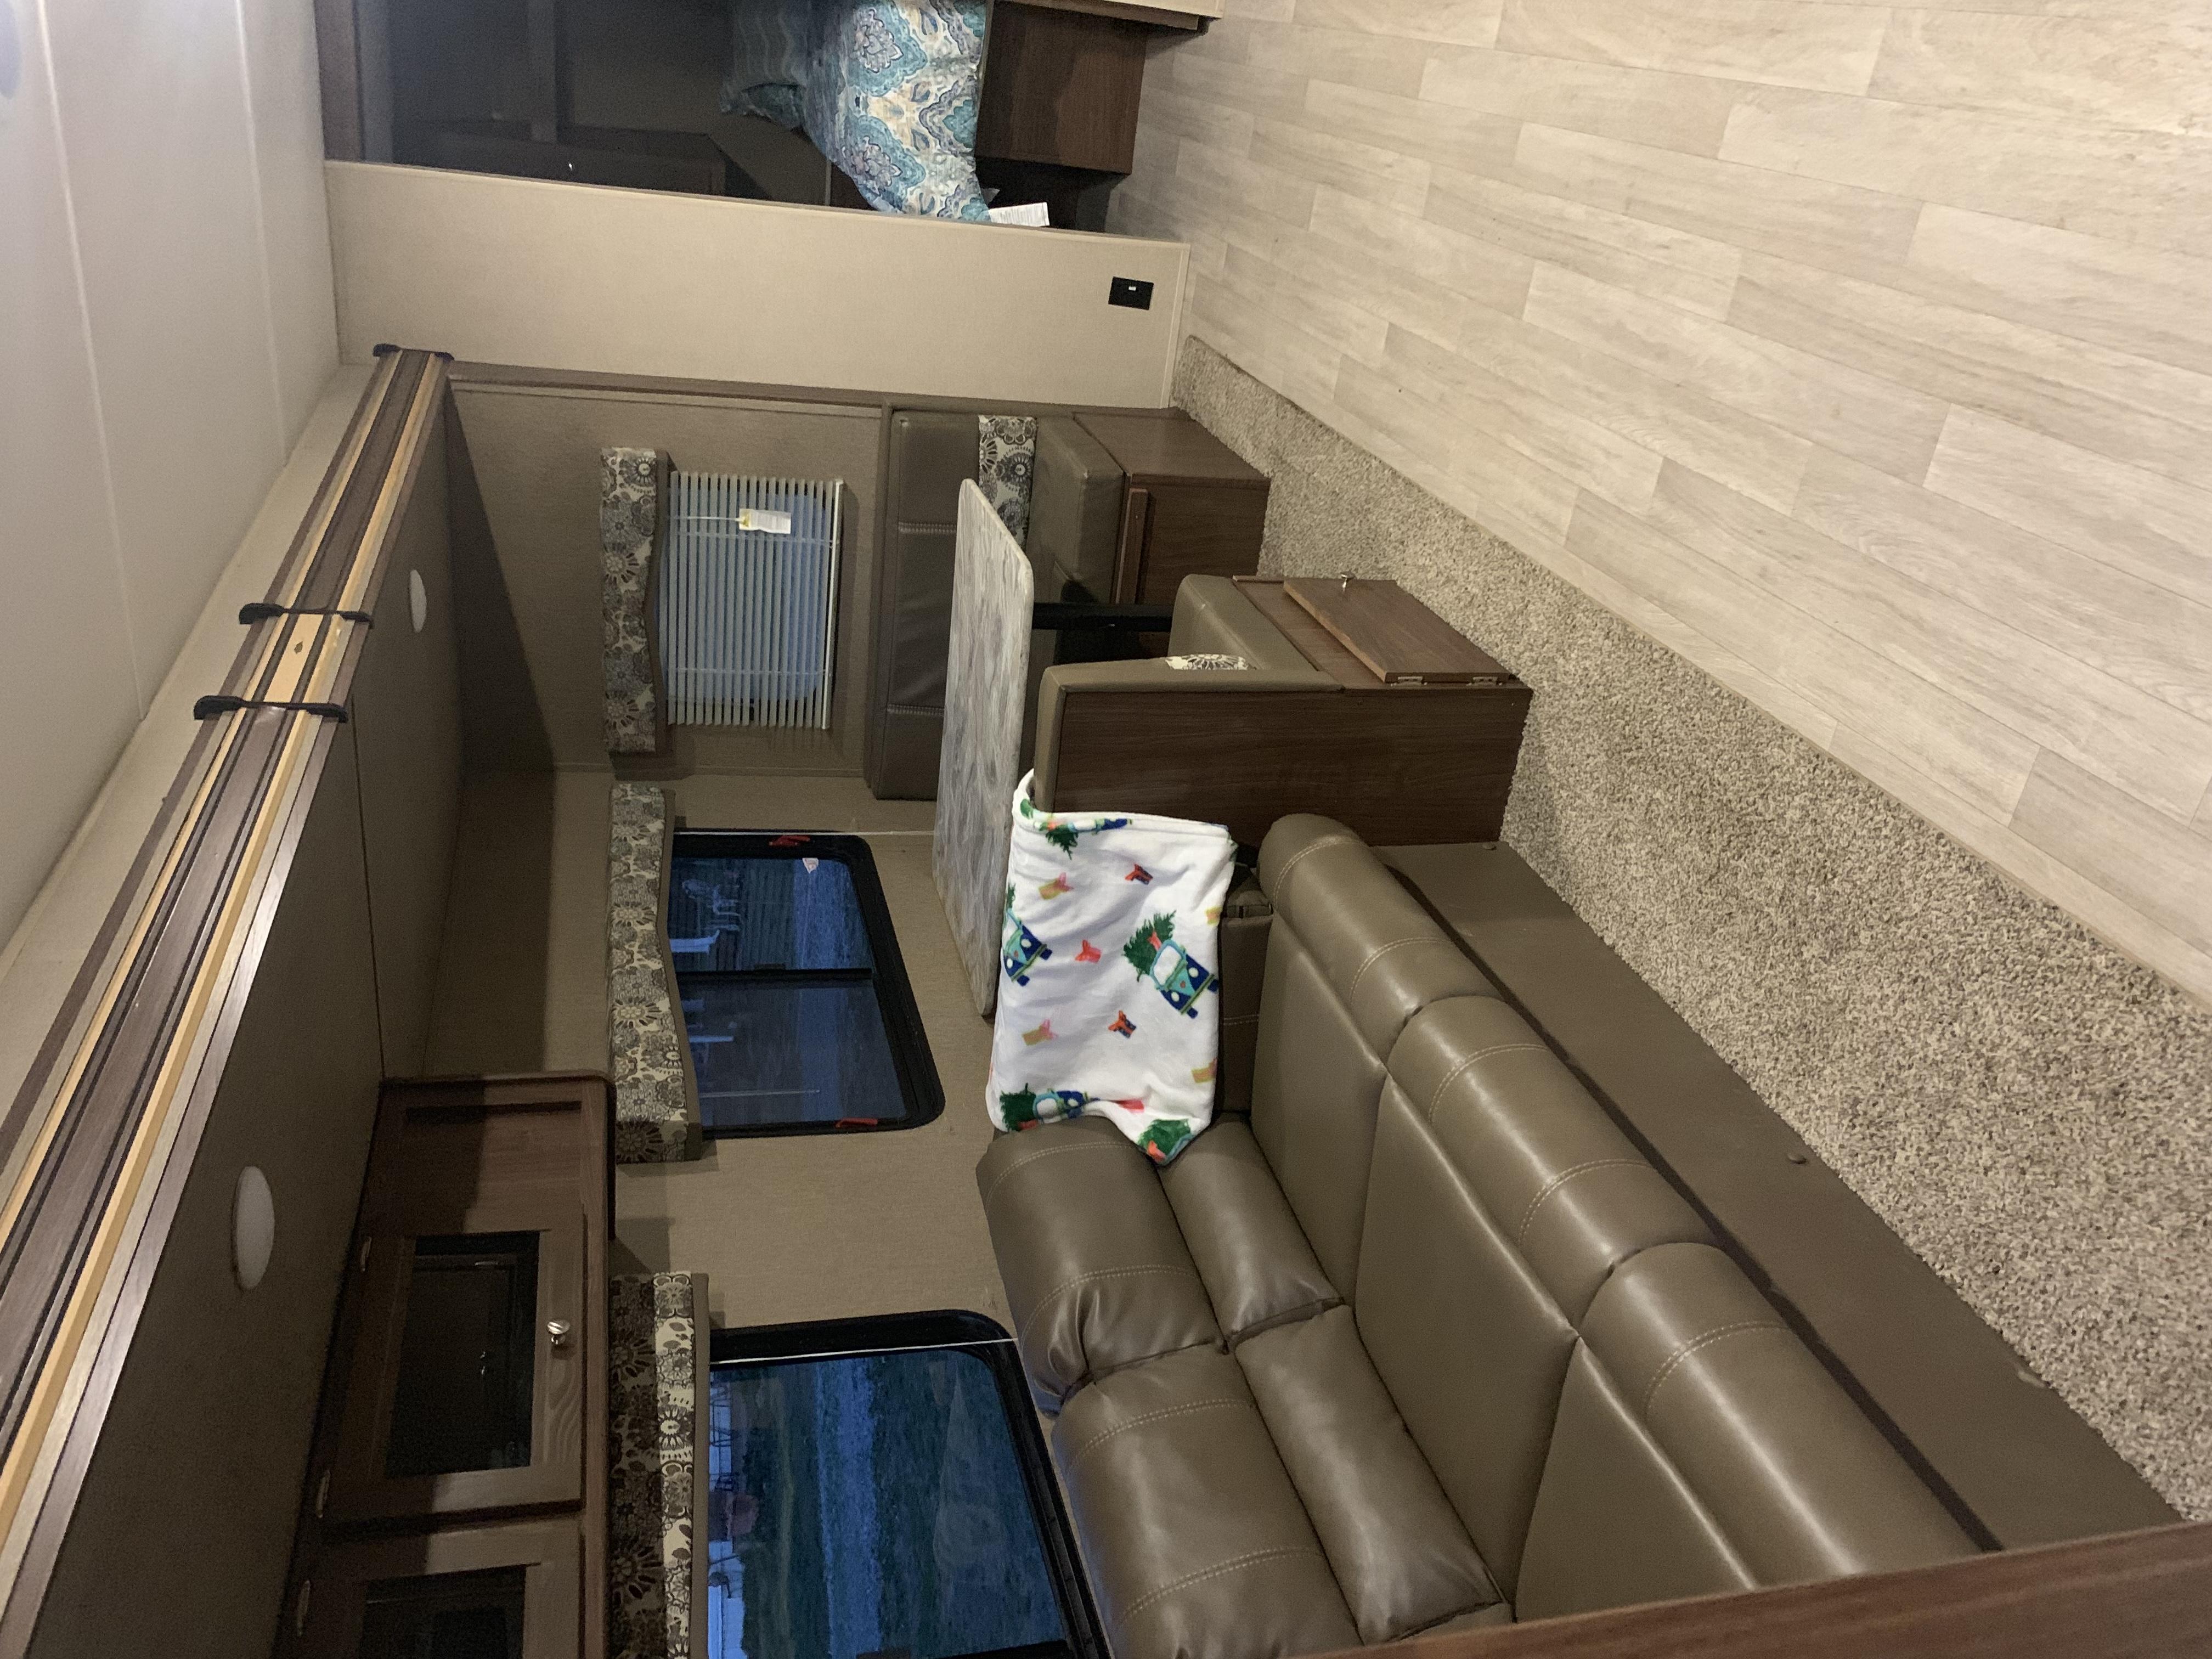 Cabin area. Coleman Lantern Edition 2018